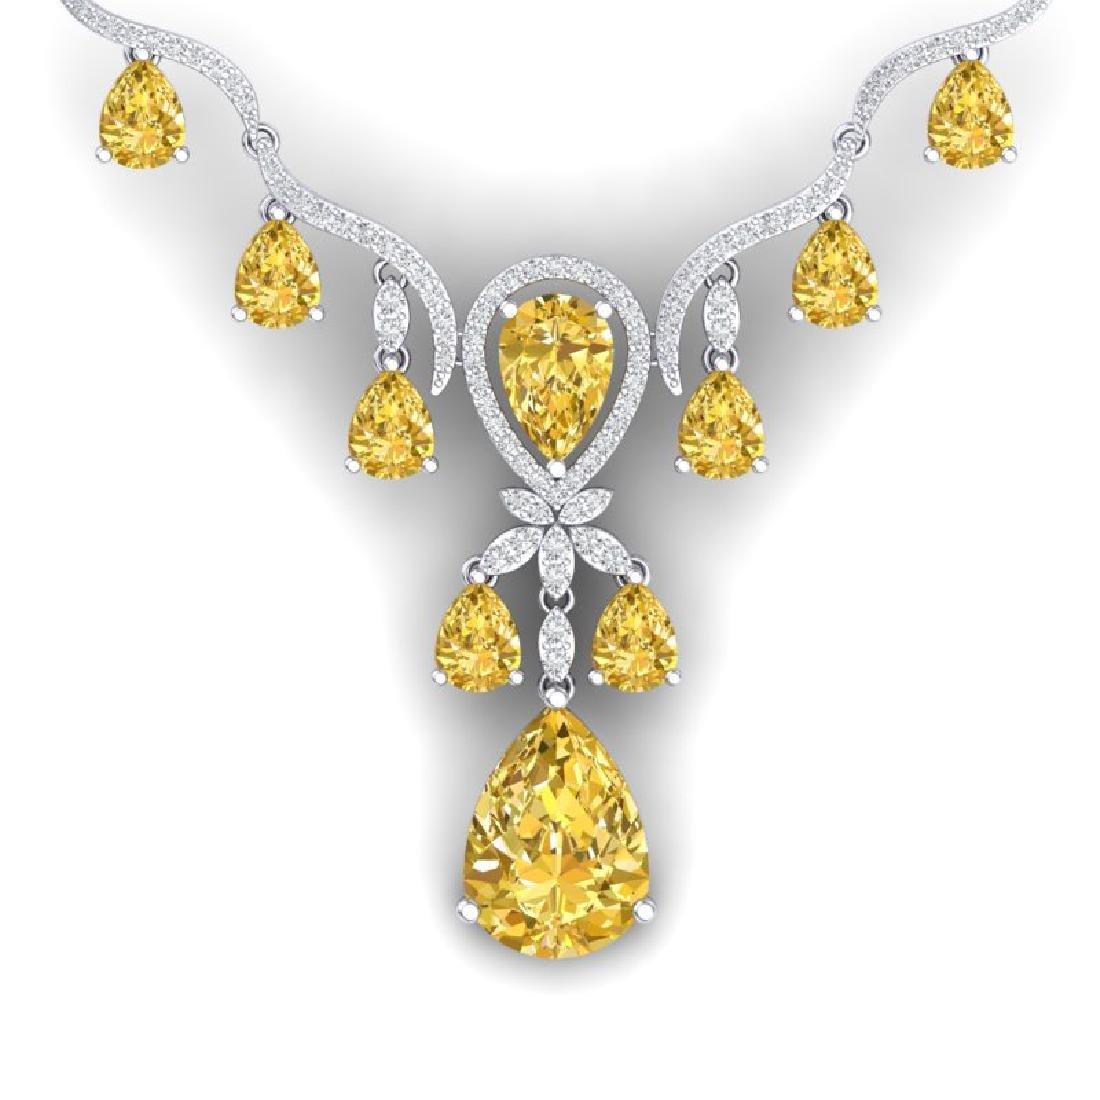 34.70 CTW Royalty Canary Citrine & VS Diamond Necklace